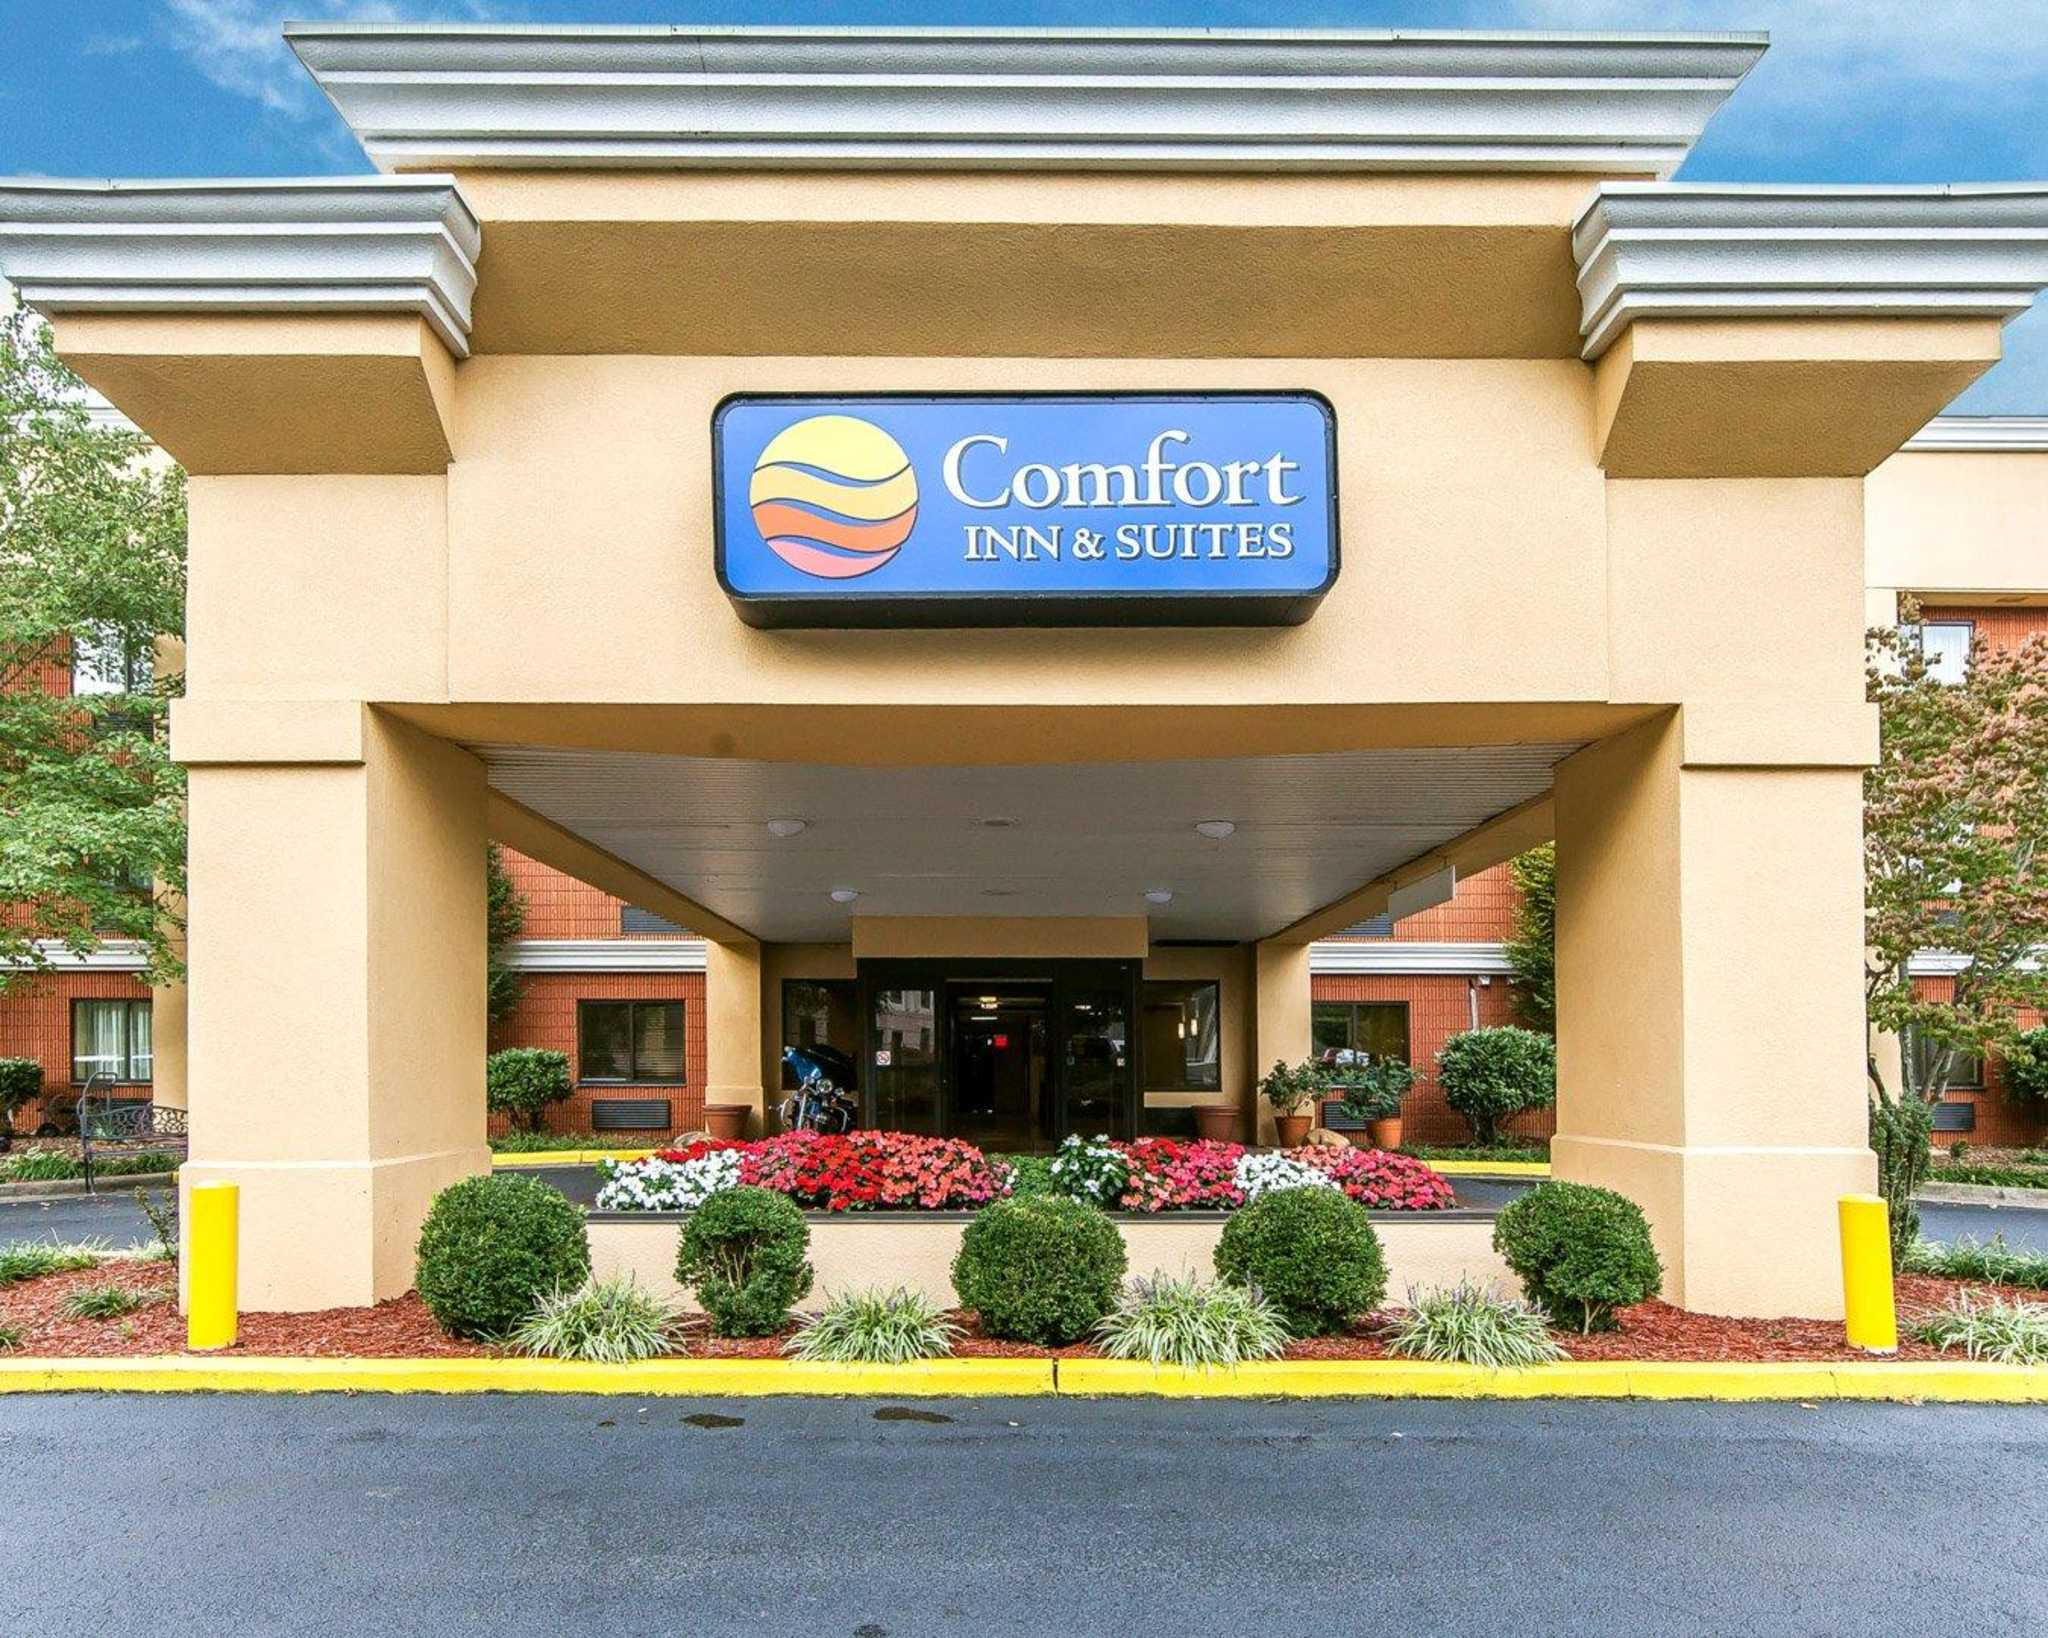 Comfort Inn & Suites image 40